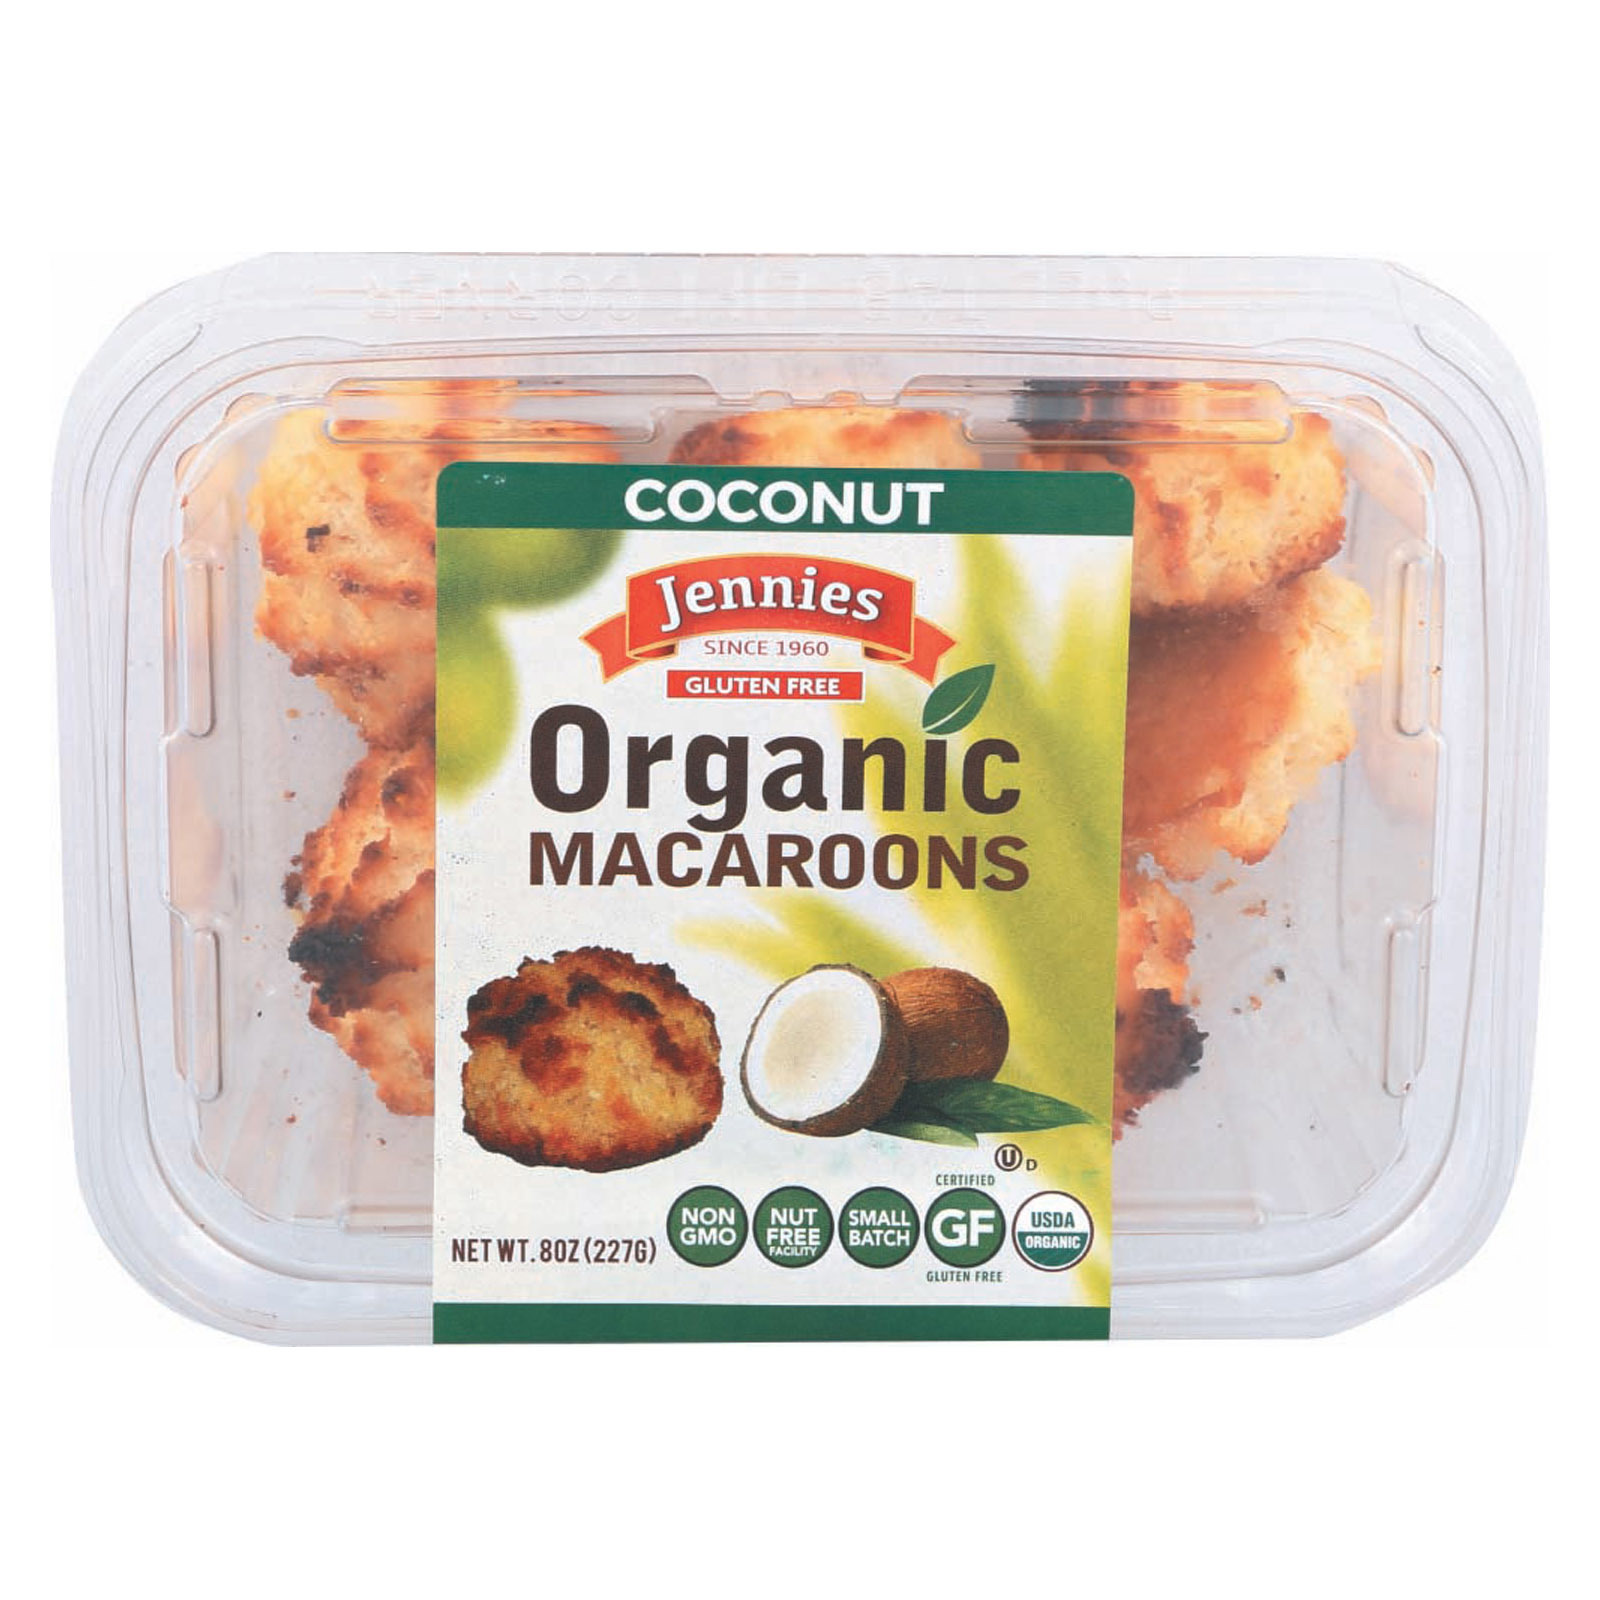 Jennies Organic Macaroon - Coconut - Case of 12 - 8 oz